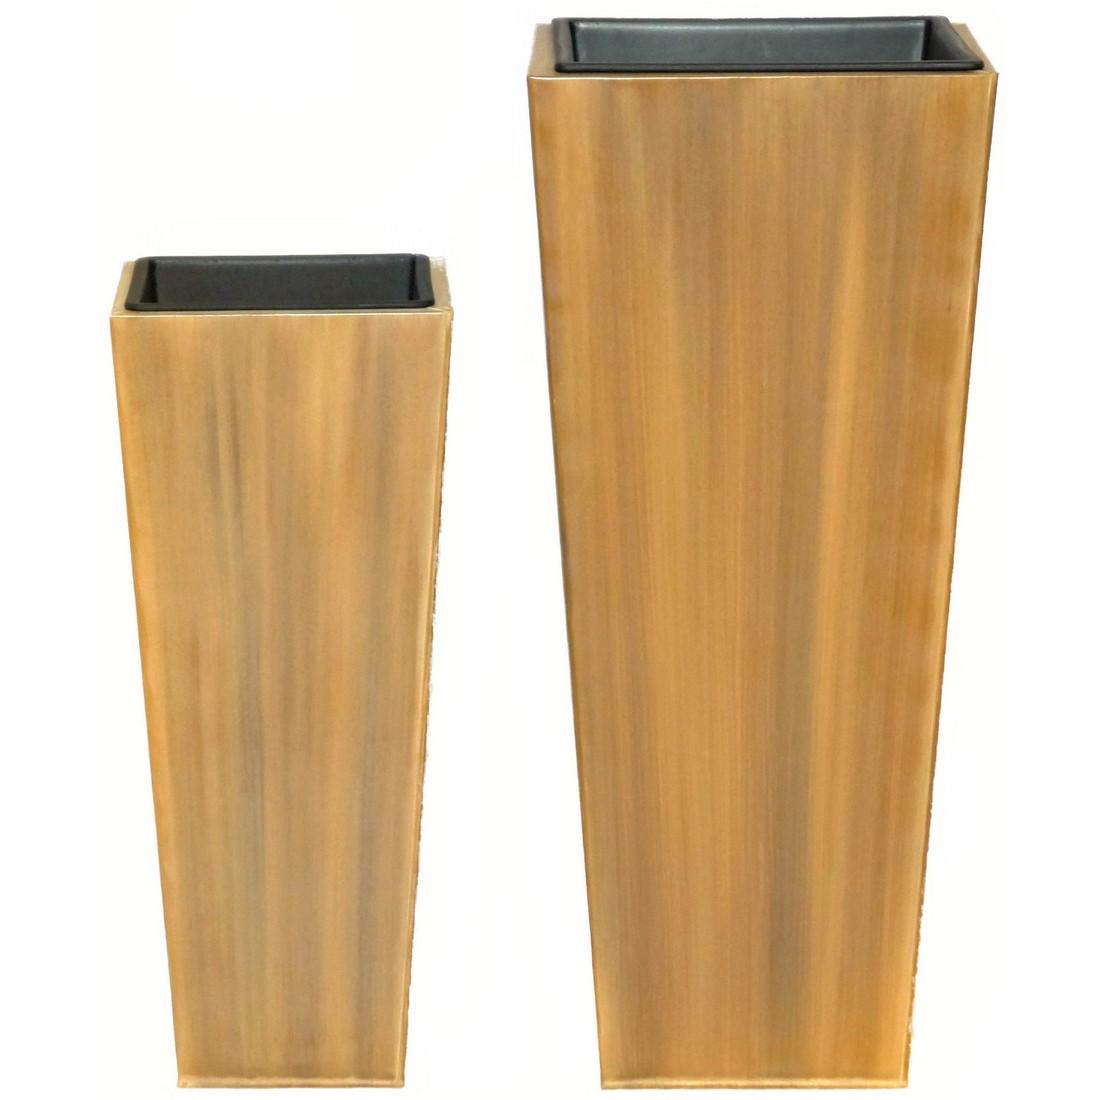 Pflanzkübel Wood – Zink – Big Sky – 2er-Set, Helmes Home & Garden jetzt kaufen